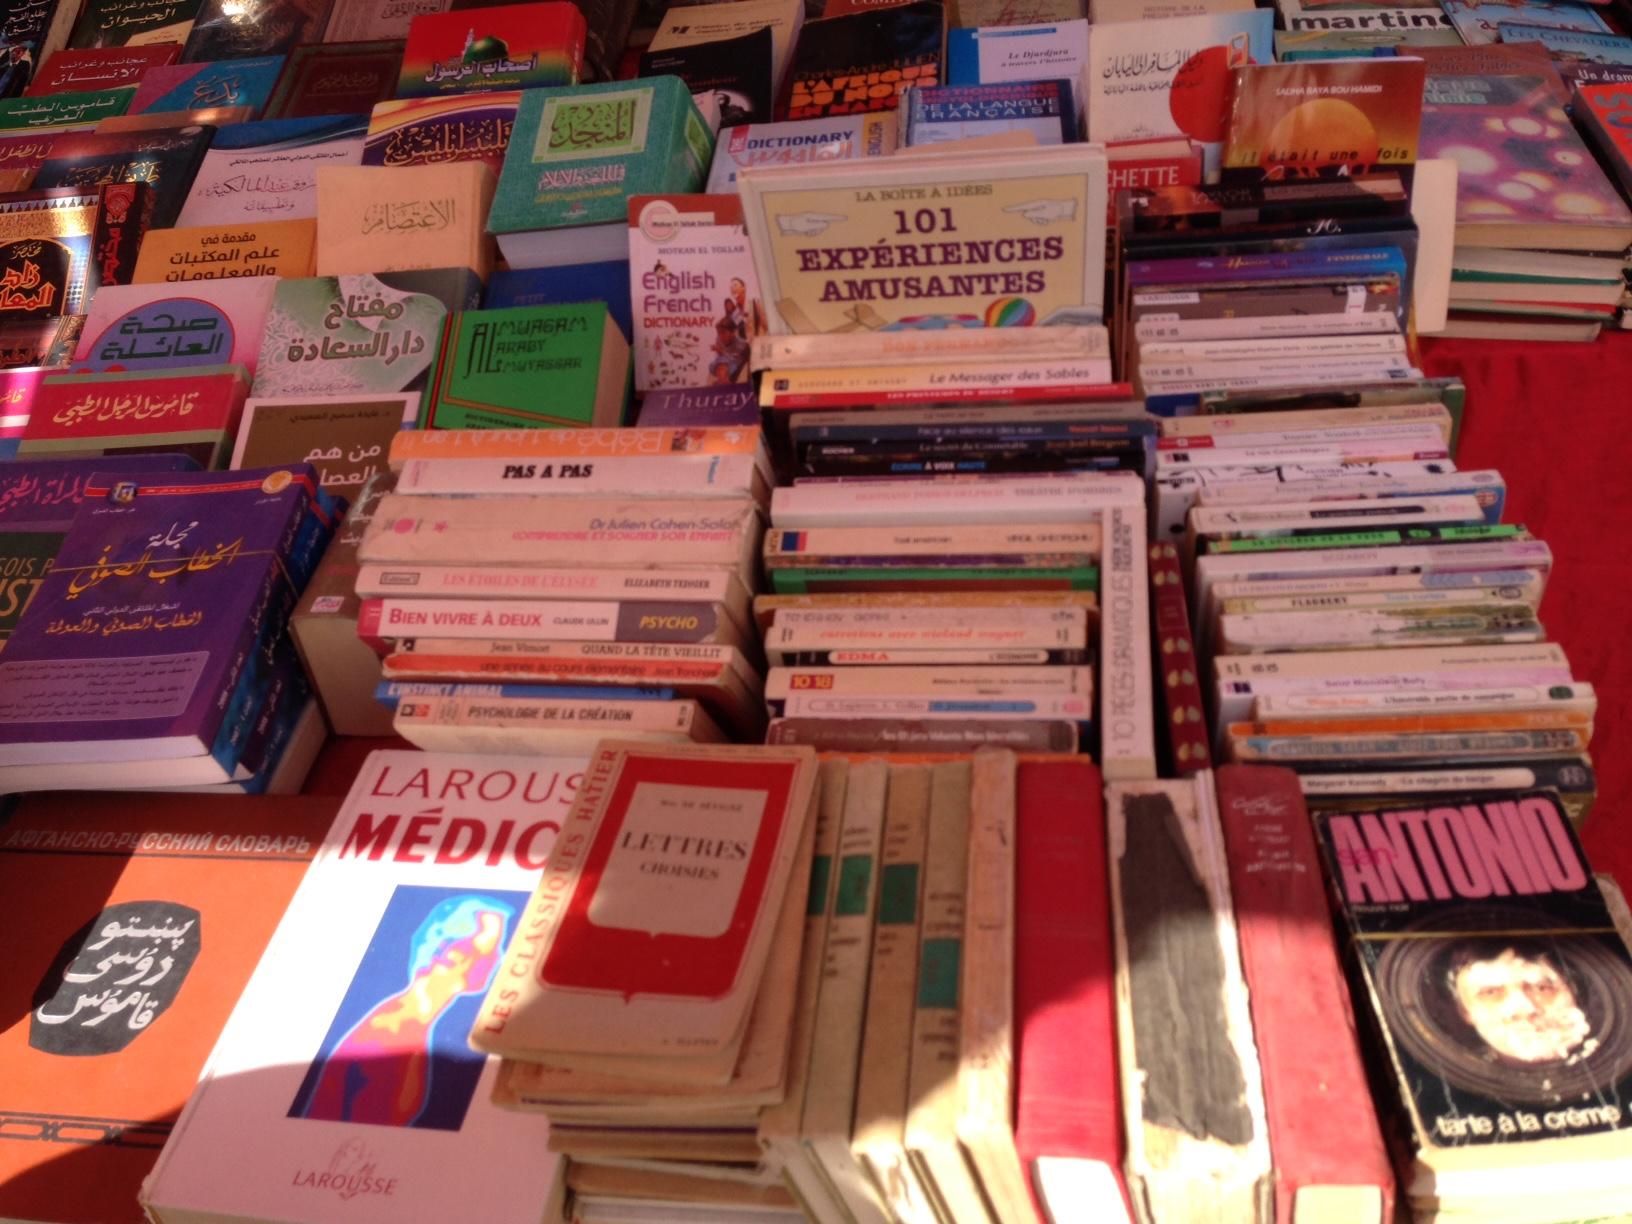 La Grande-Poste Garden Vendor Books